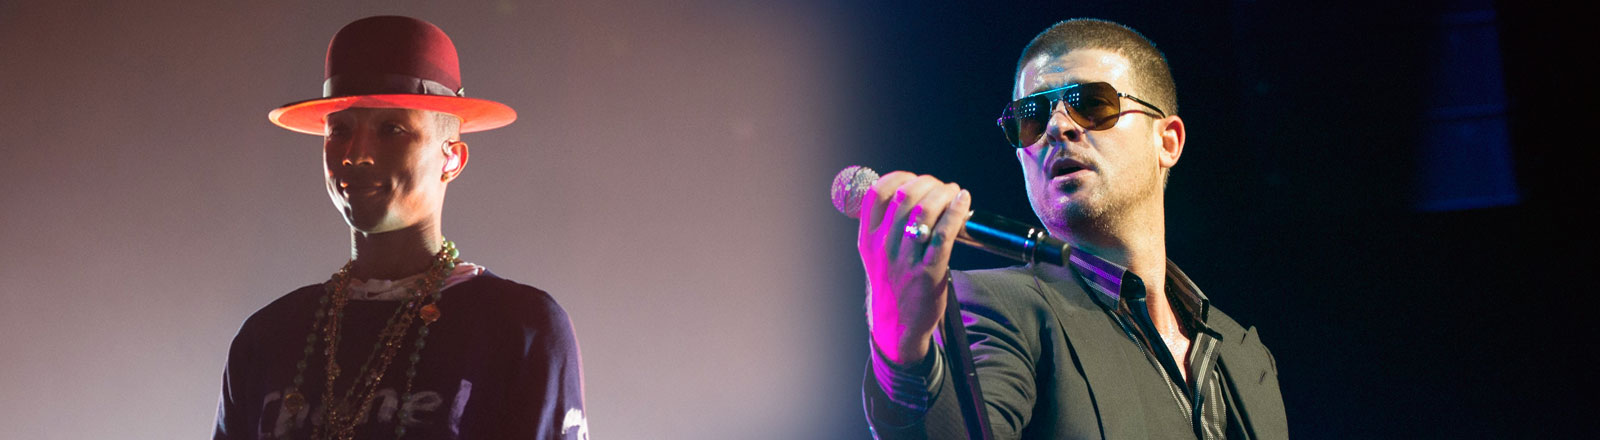 Musiker Robin Thicke und Pharrell Williams